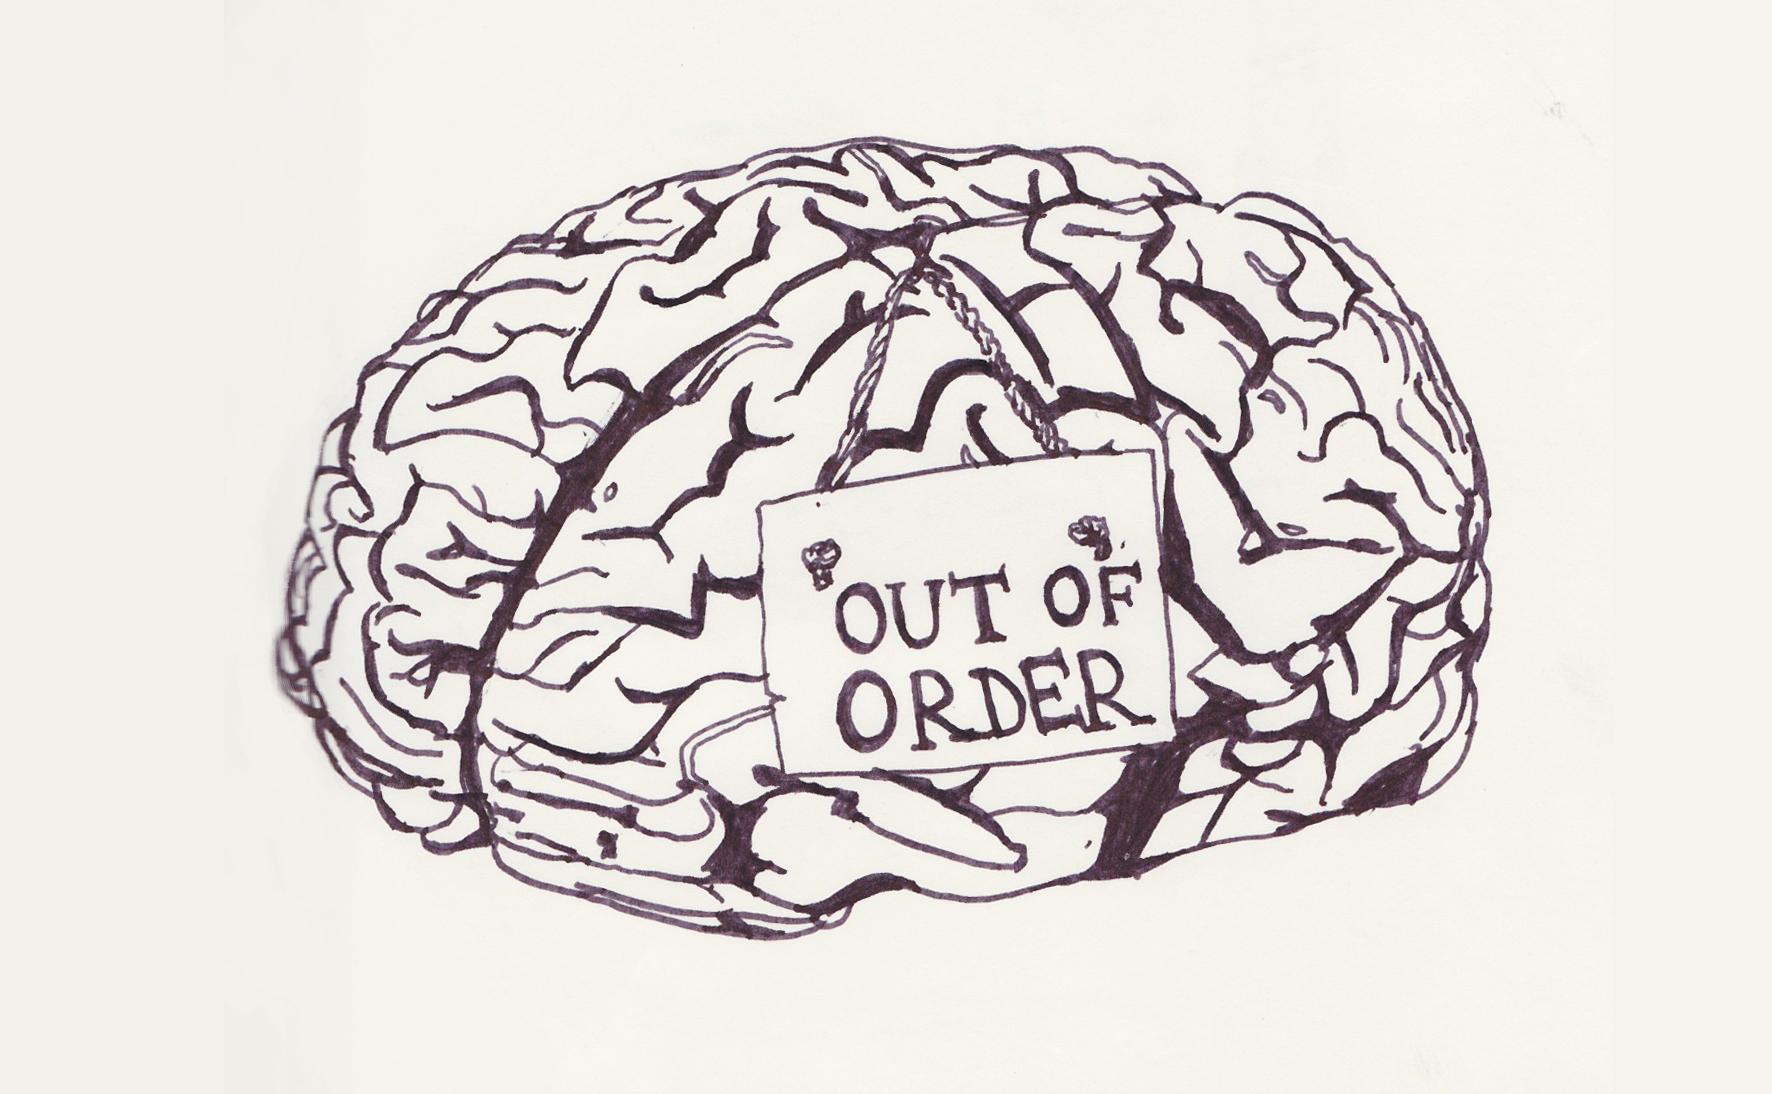 outoforder copy.jpg